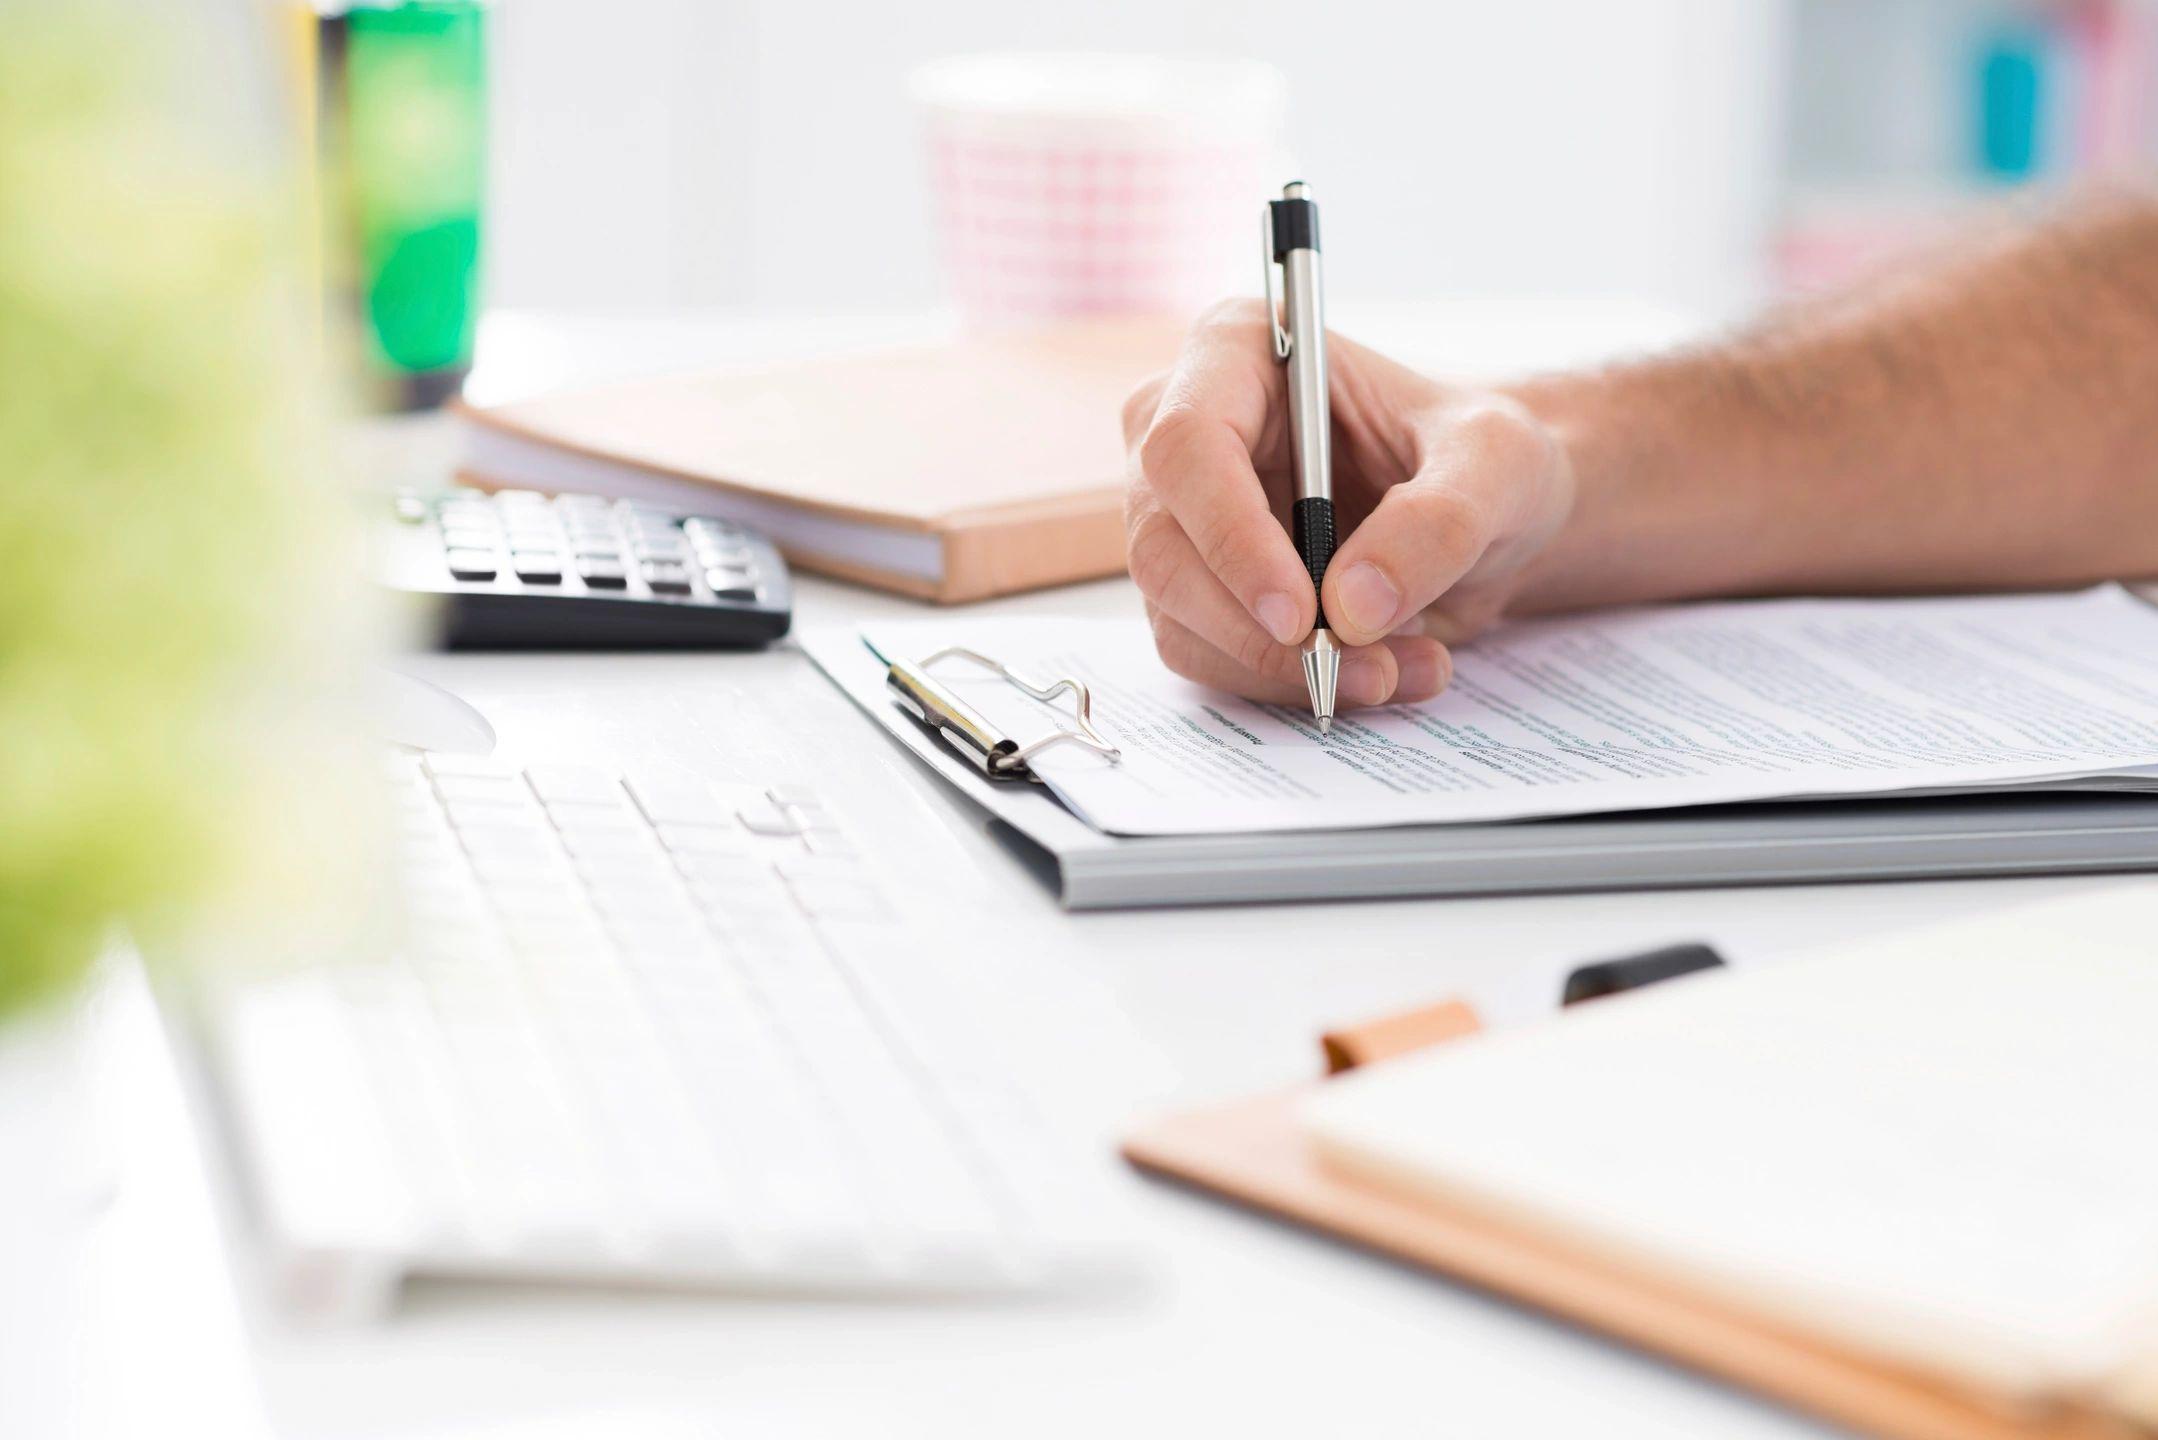 Power Workplace Productivity By Streamlining Employee To-Do Lists